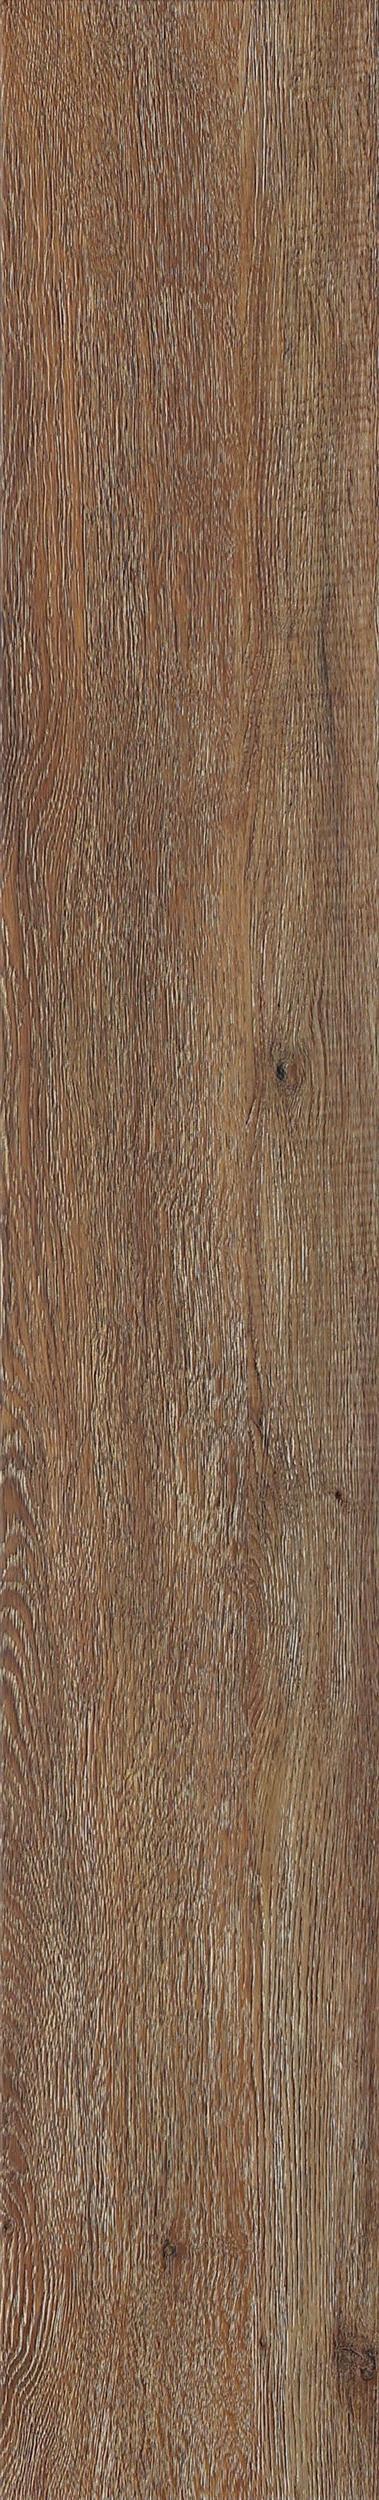 008 Umber Oak